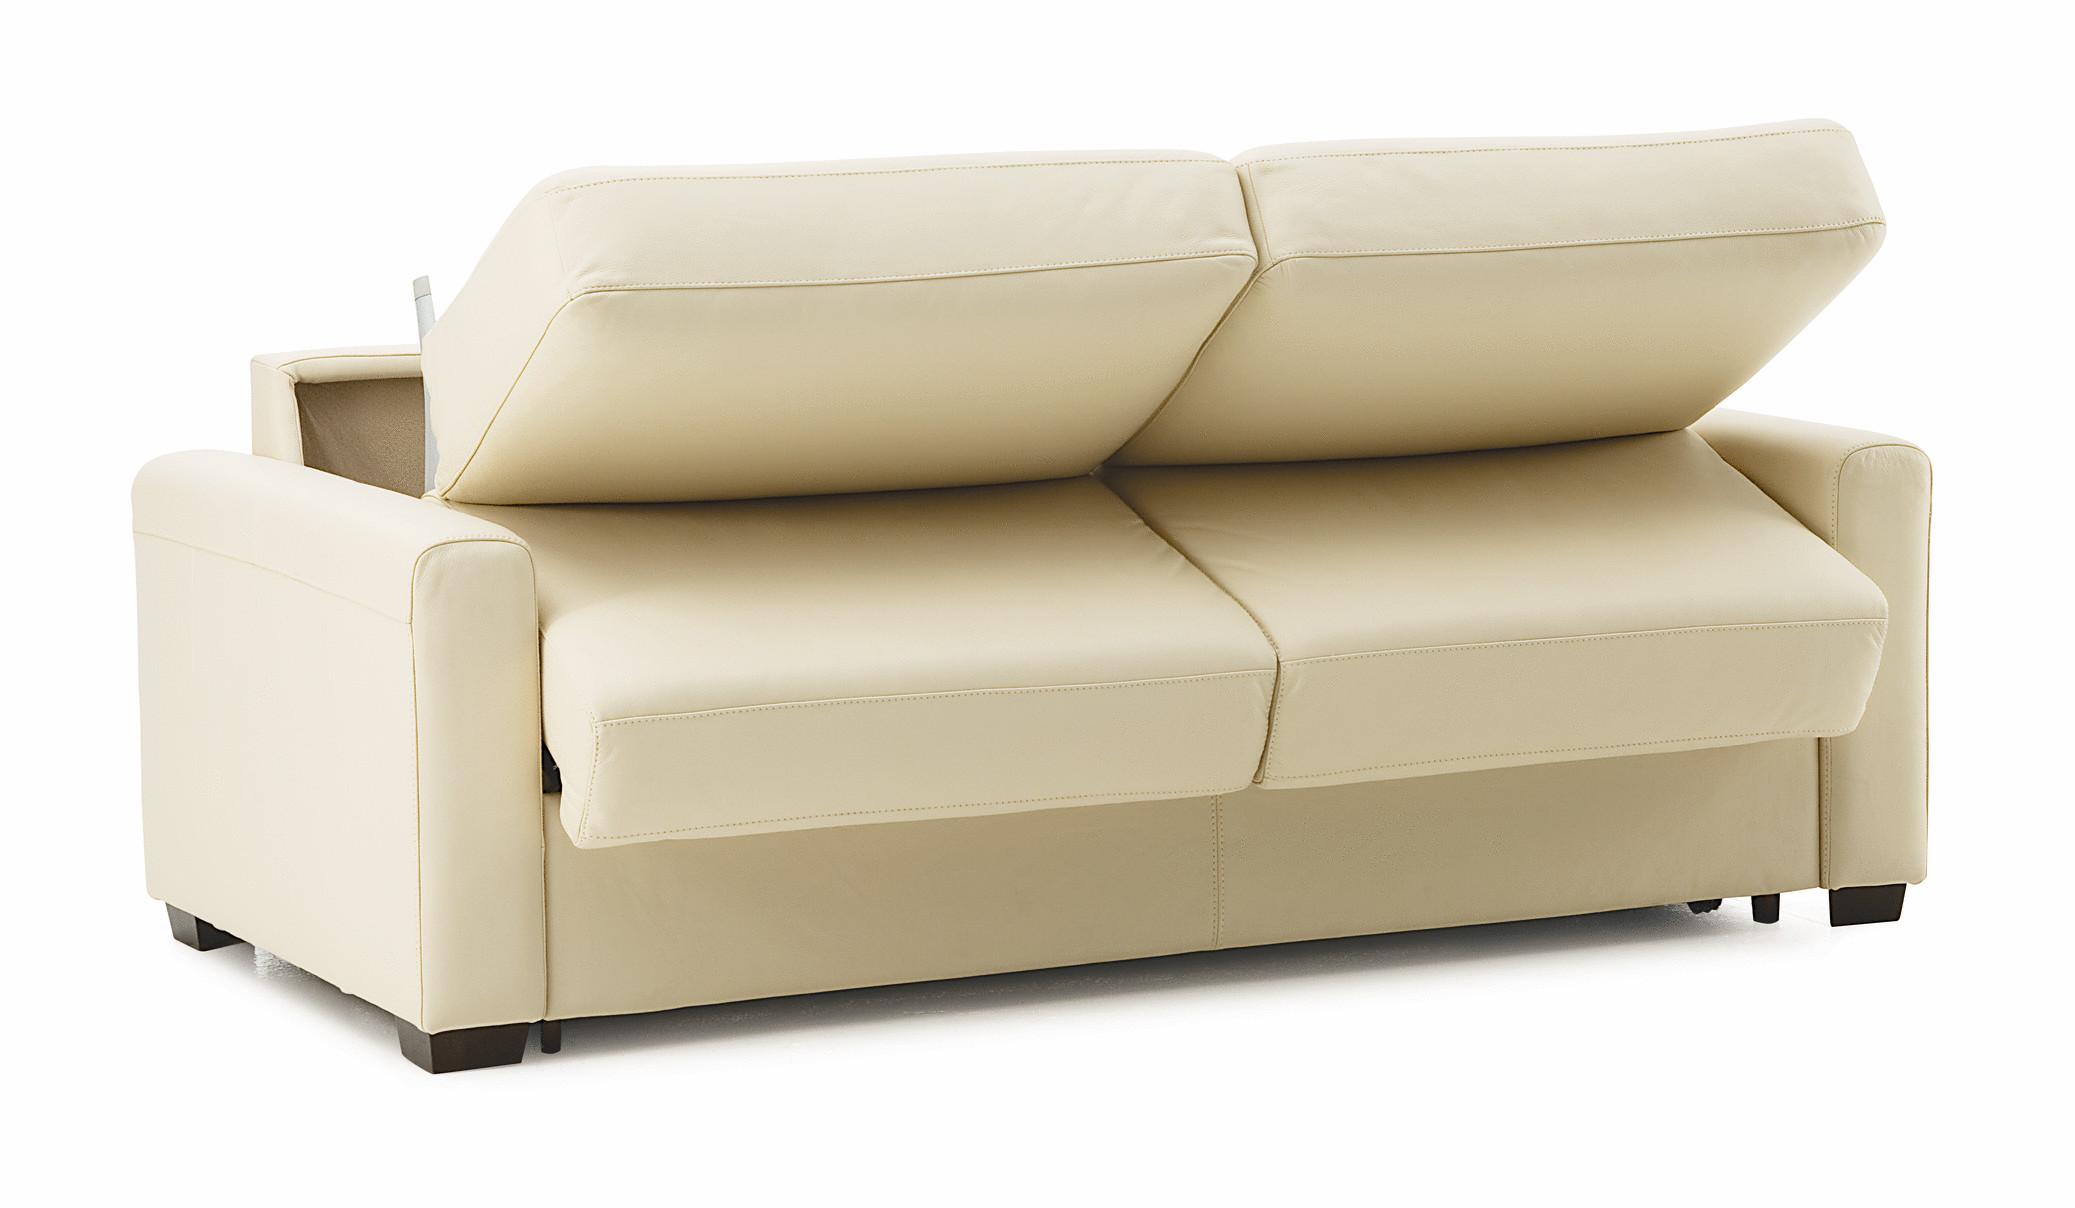 sofa sleepers high end sleeper sofa and furniture seating sleepers roommate sofa sleeper MNTDZEQ